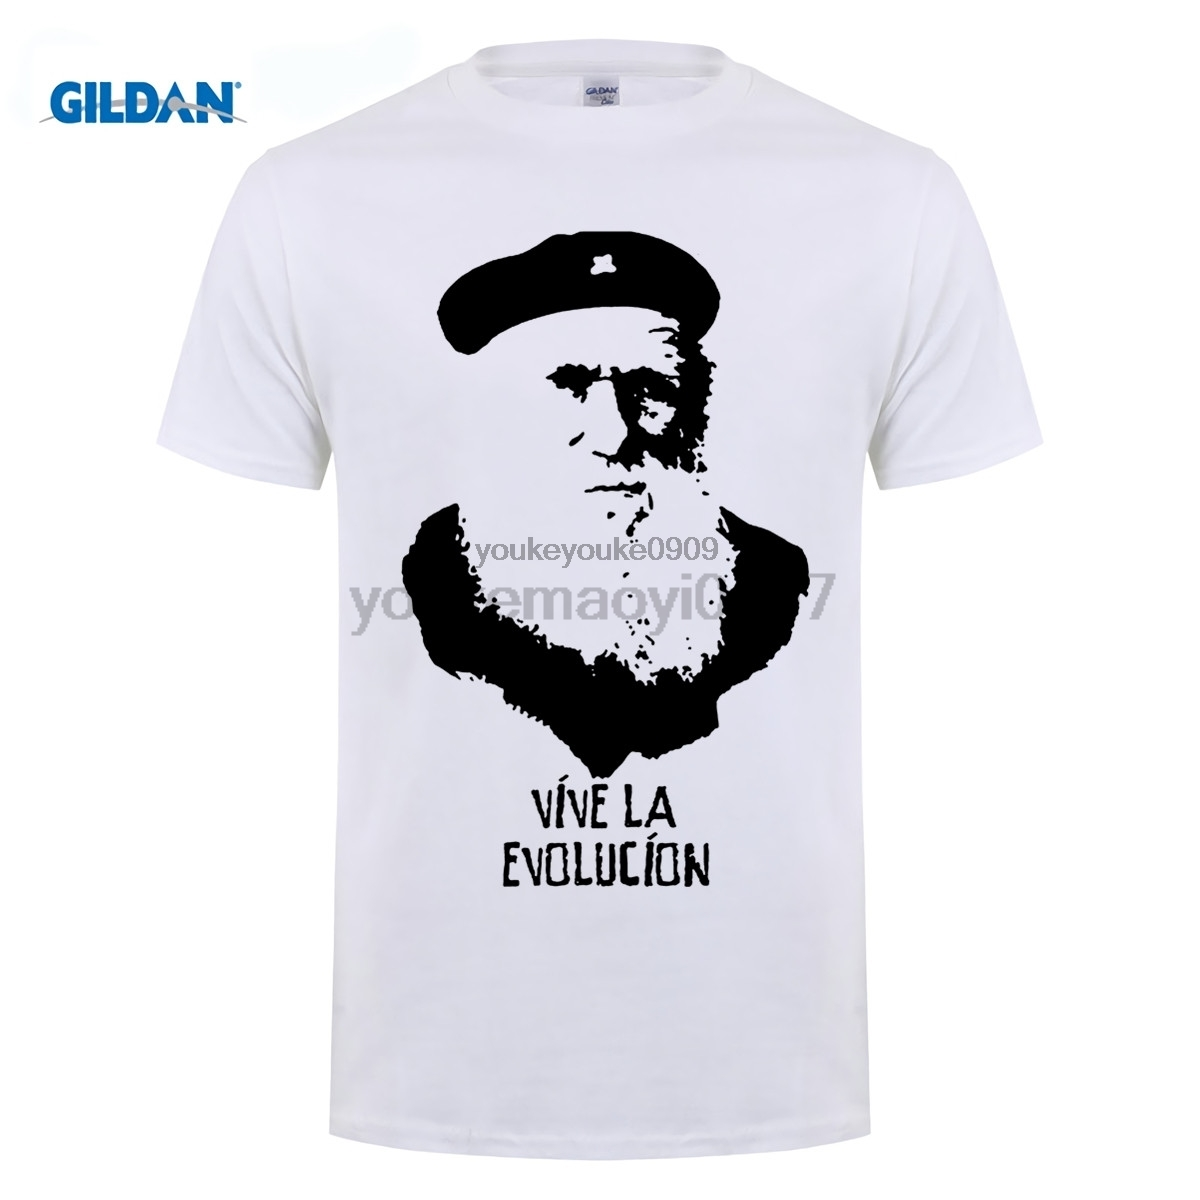 GILDAN Charles Darwin Evolution T-Shirt 100% Cotton Origin Of The Species Atheist Cool Casual Sleeves T Shirt Fashion